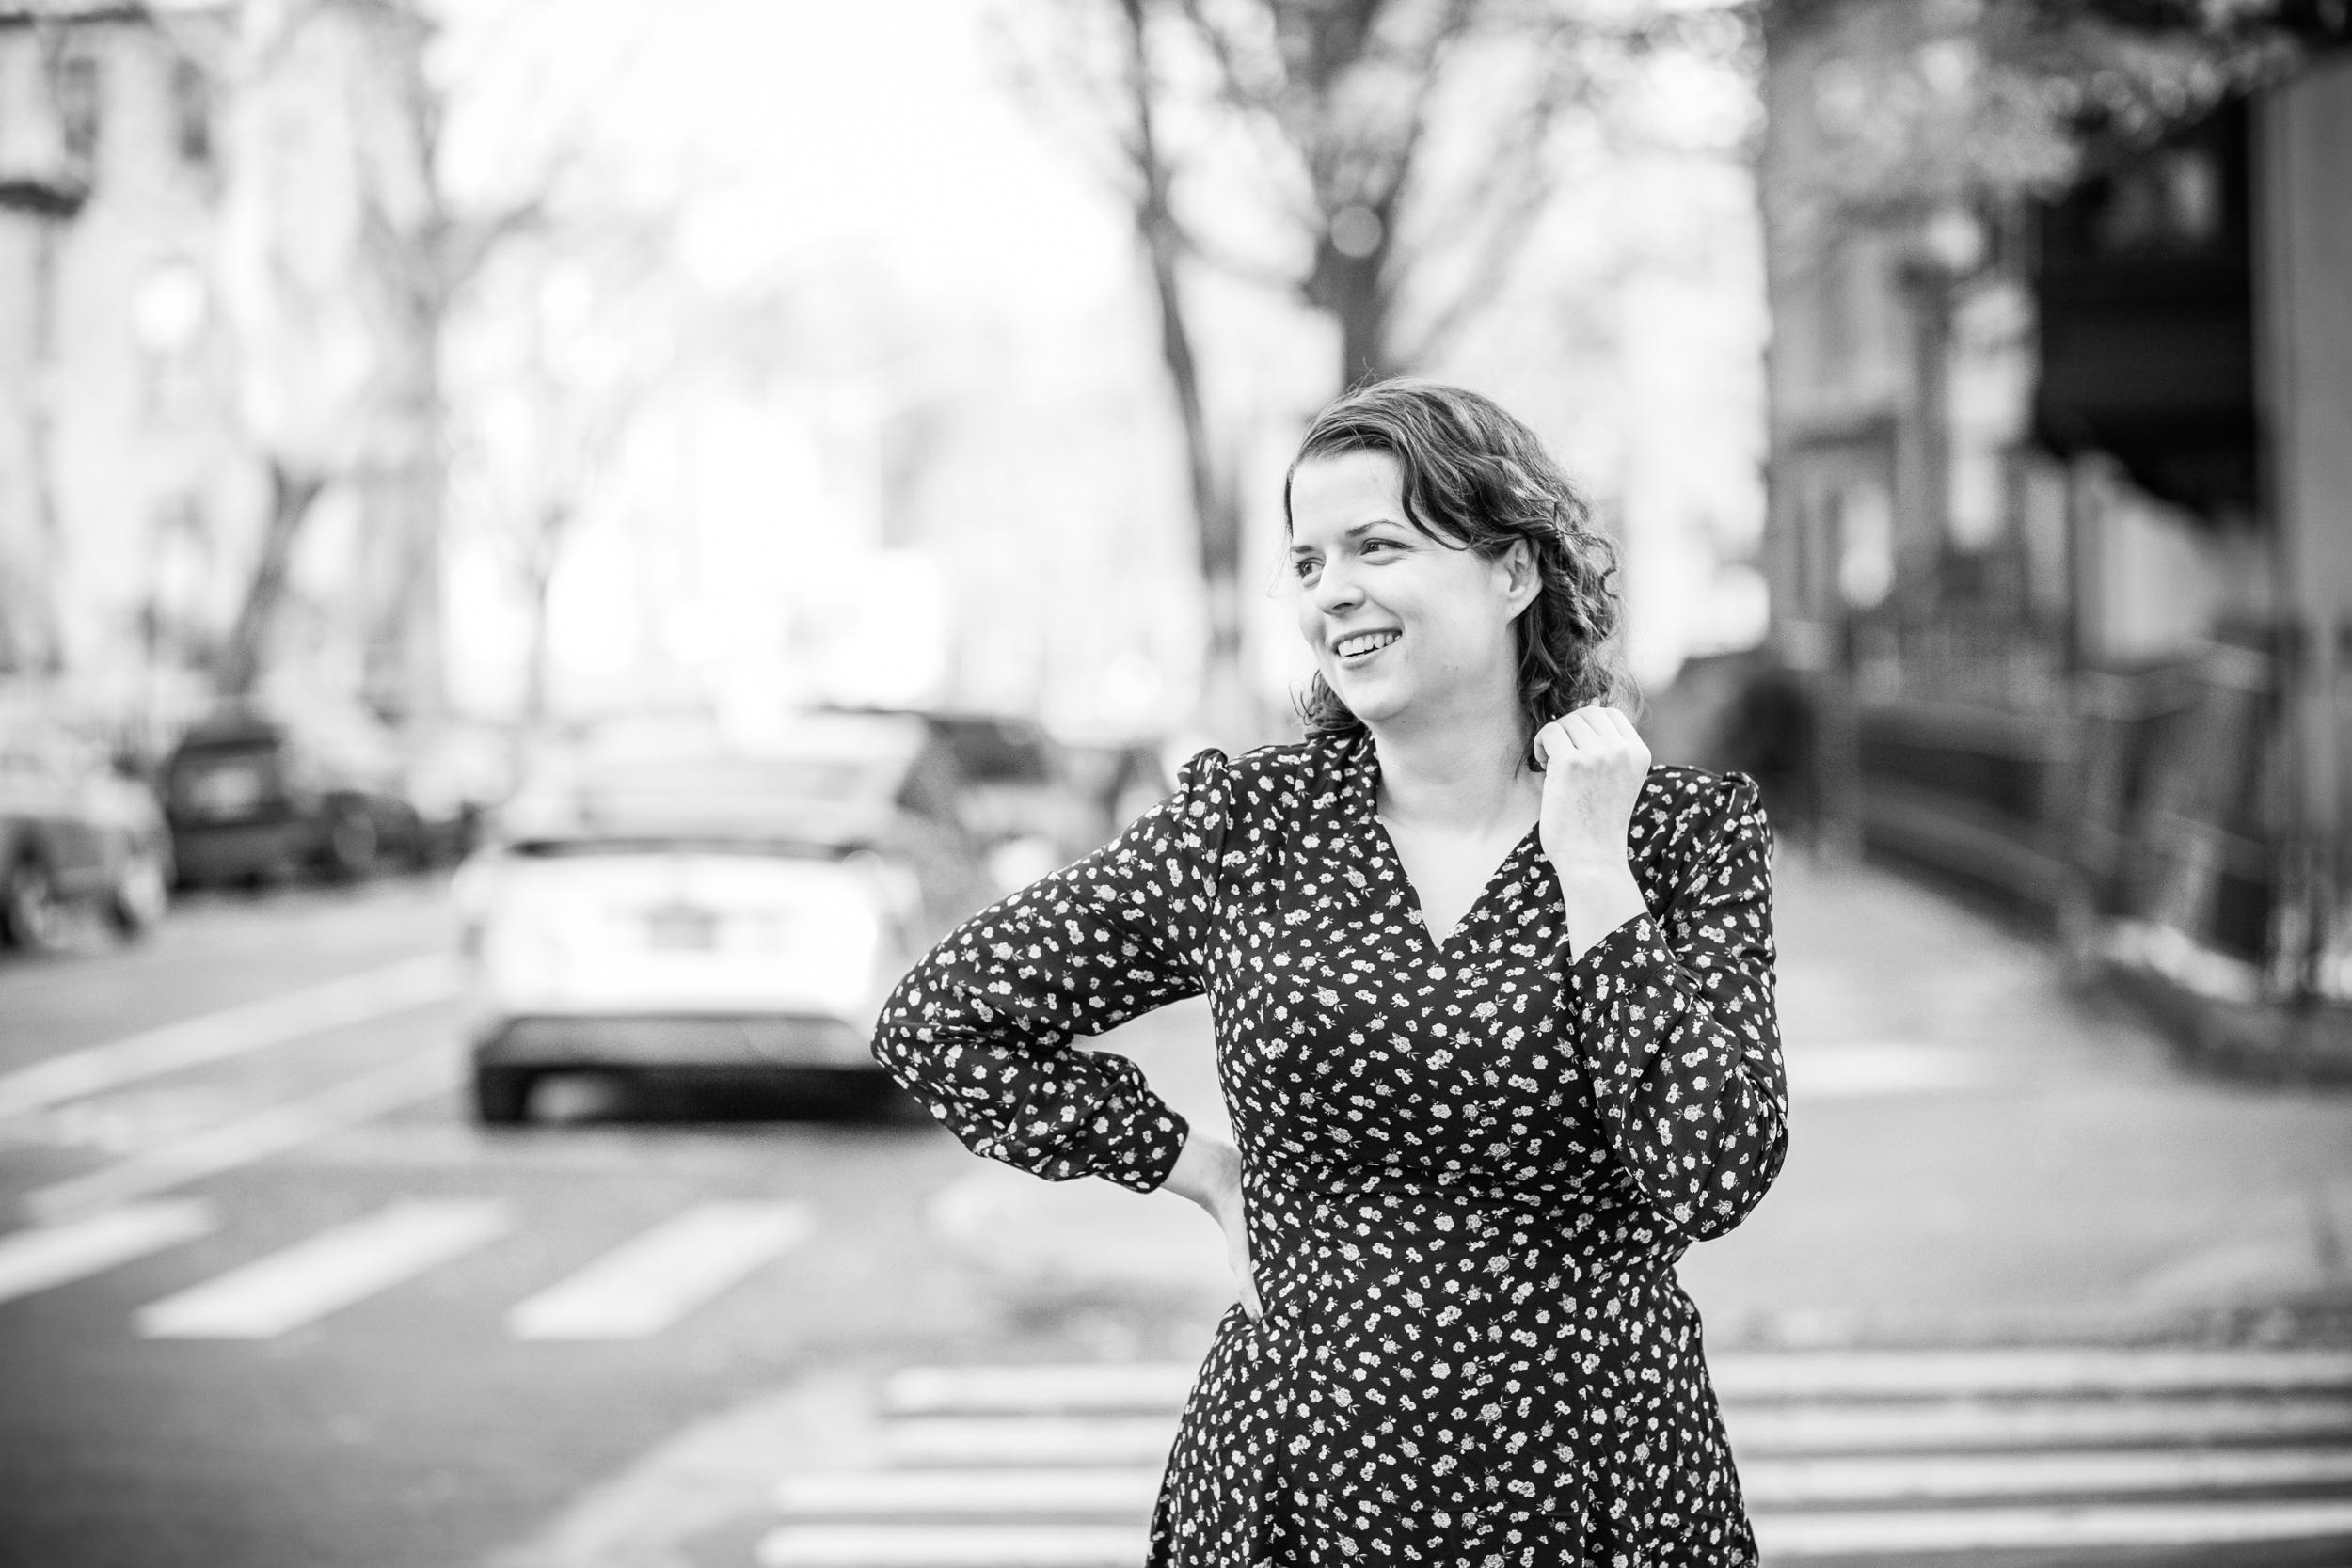 portrait-photography-new-york-city-photographer-10.jpg